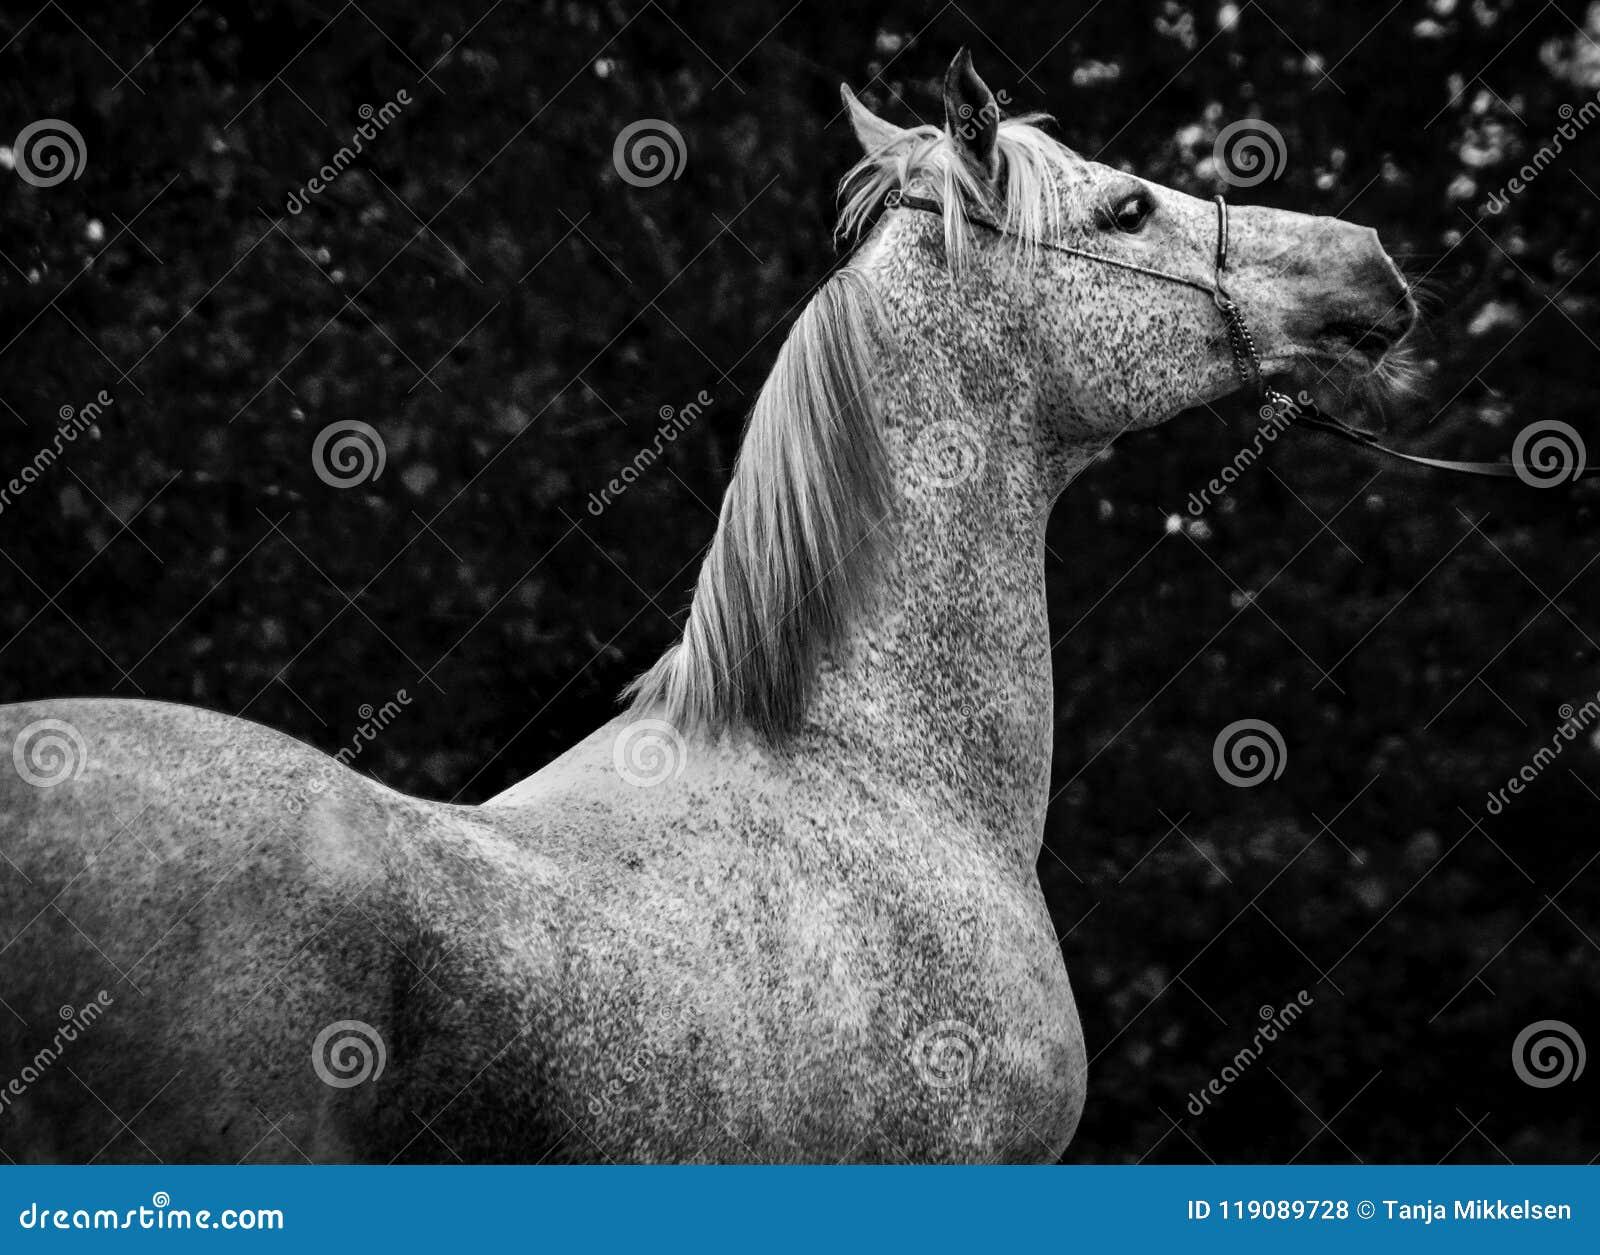 15 824 Arabian Horse Photos Free Royalty Free Stock Photos From Dreamstime